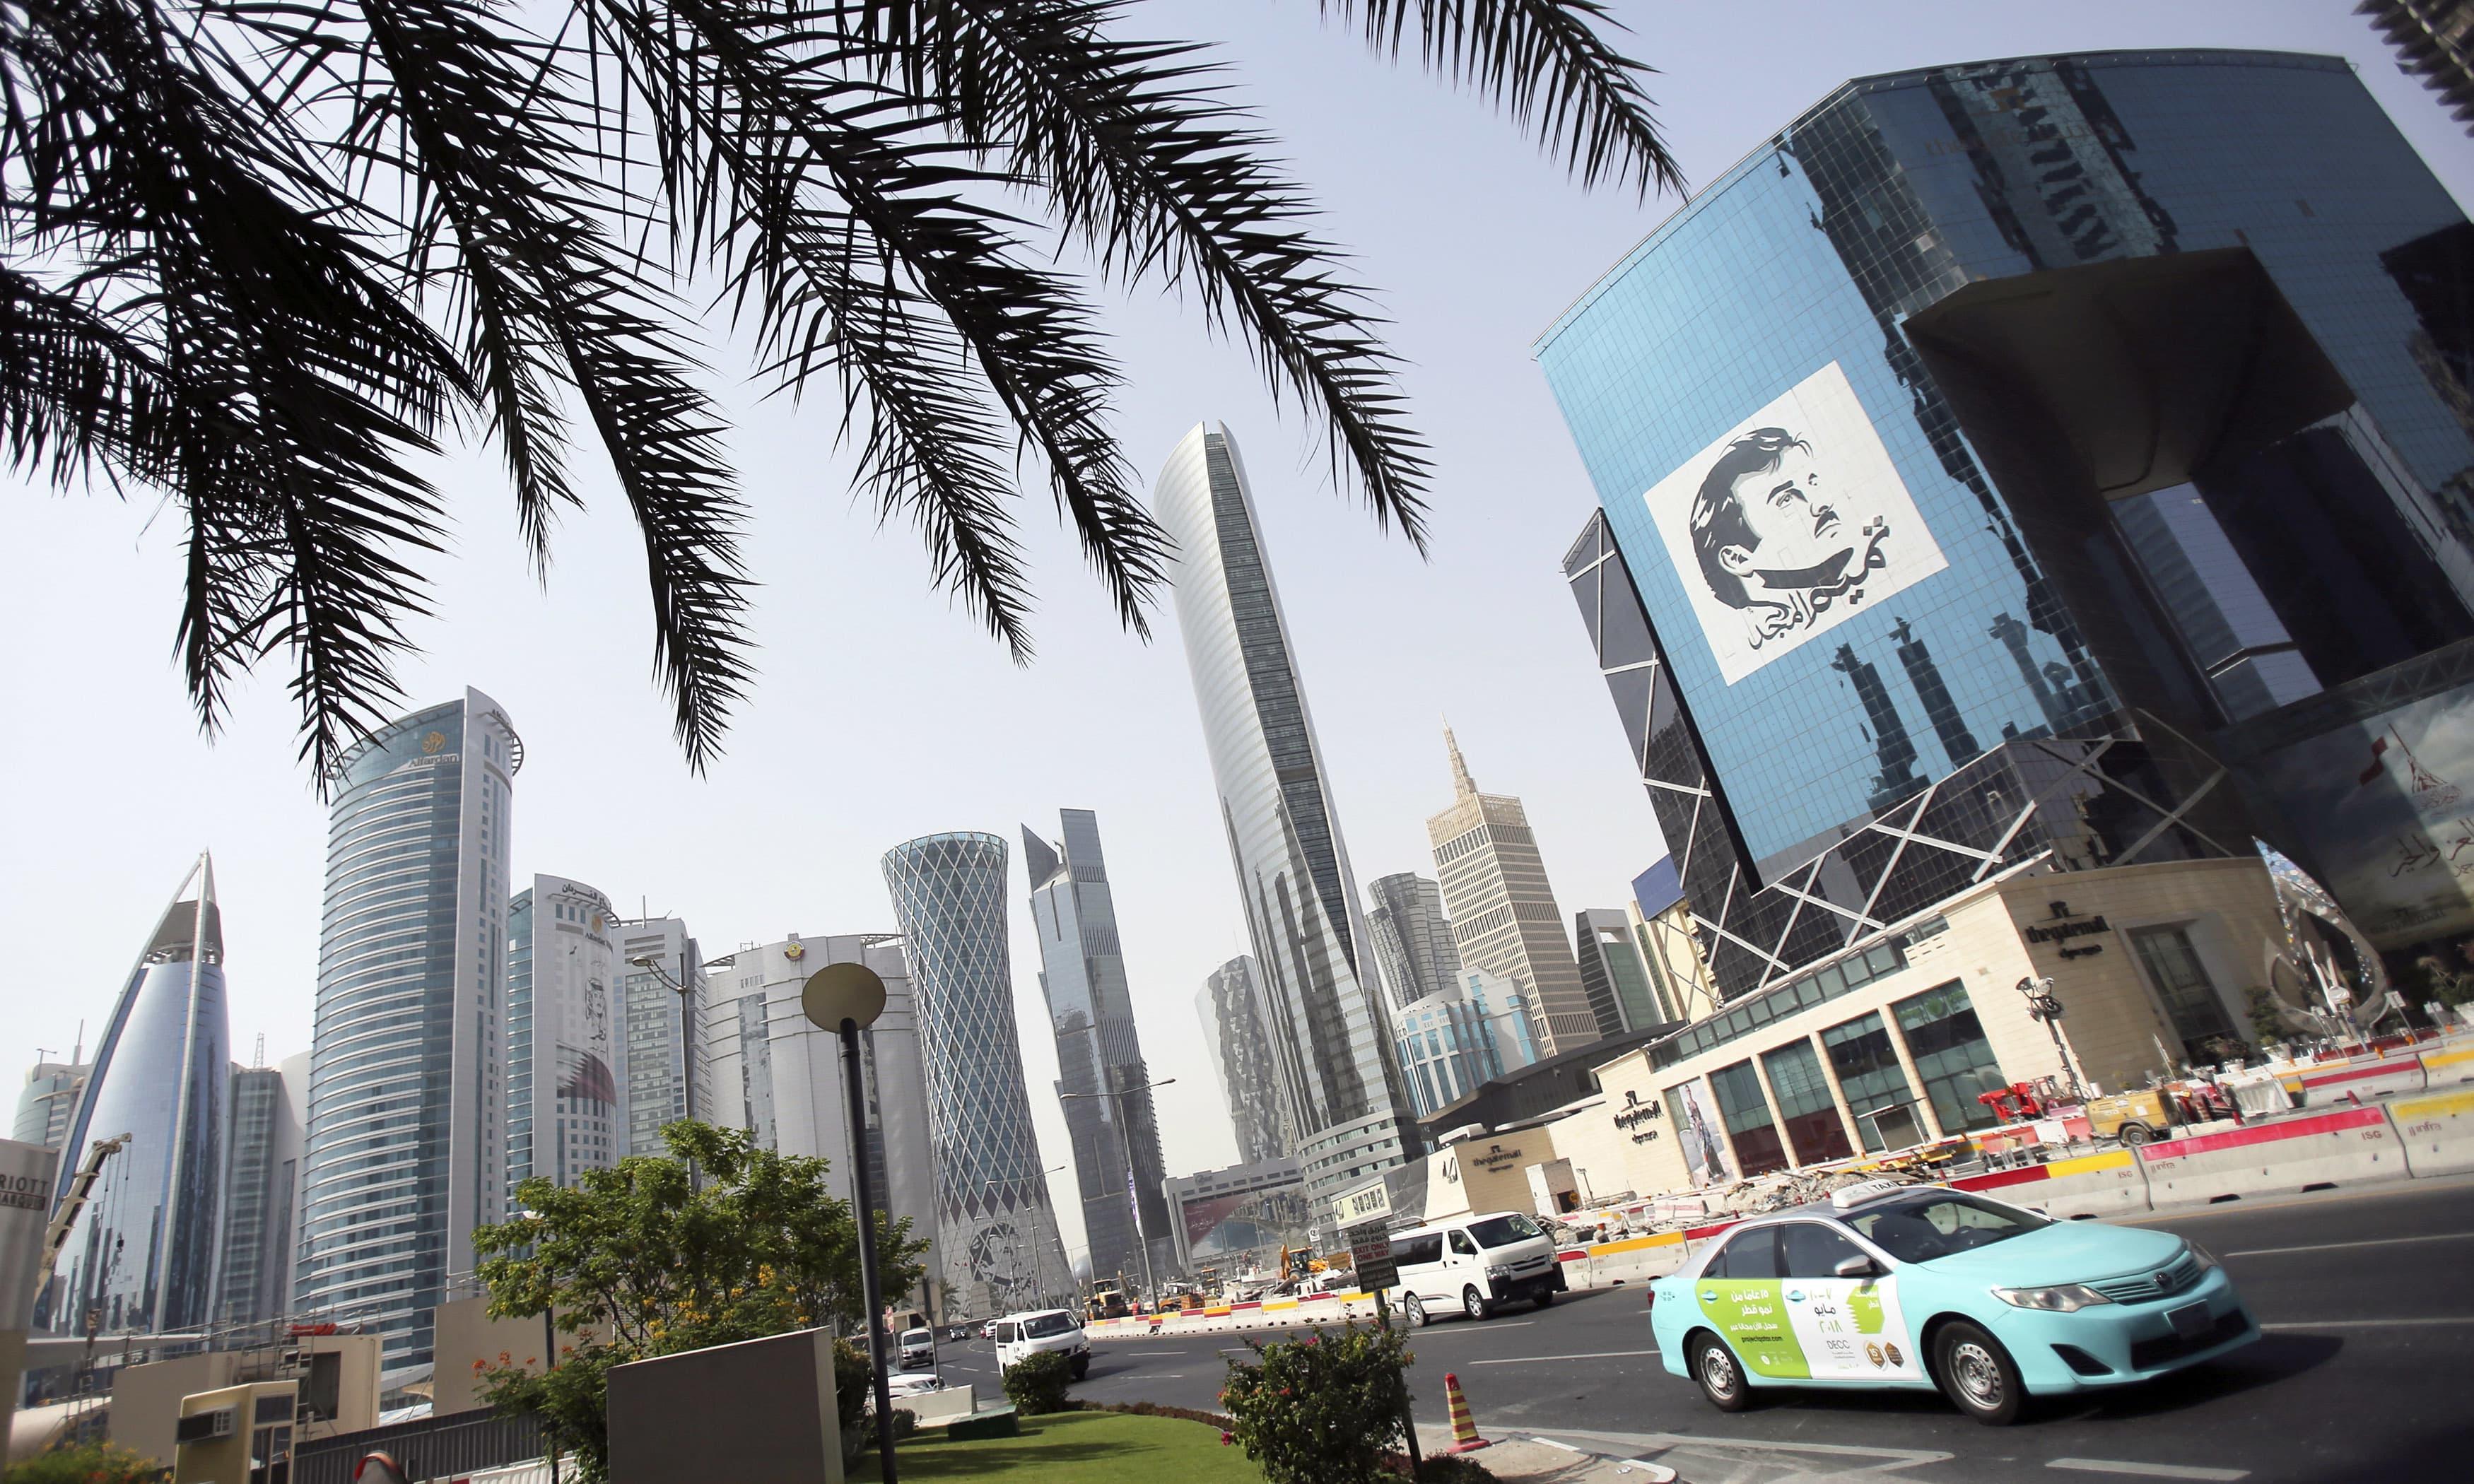 Turkey, Iran help wealthy Qatar thrive, 1 year into blockade